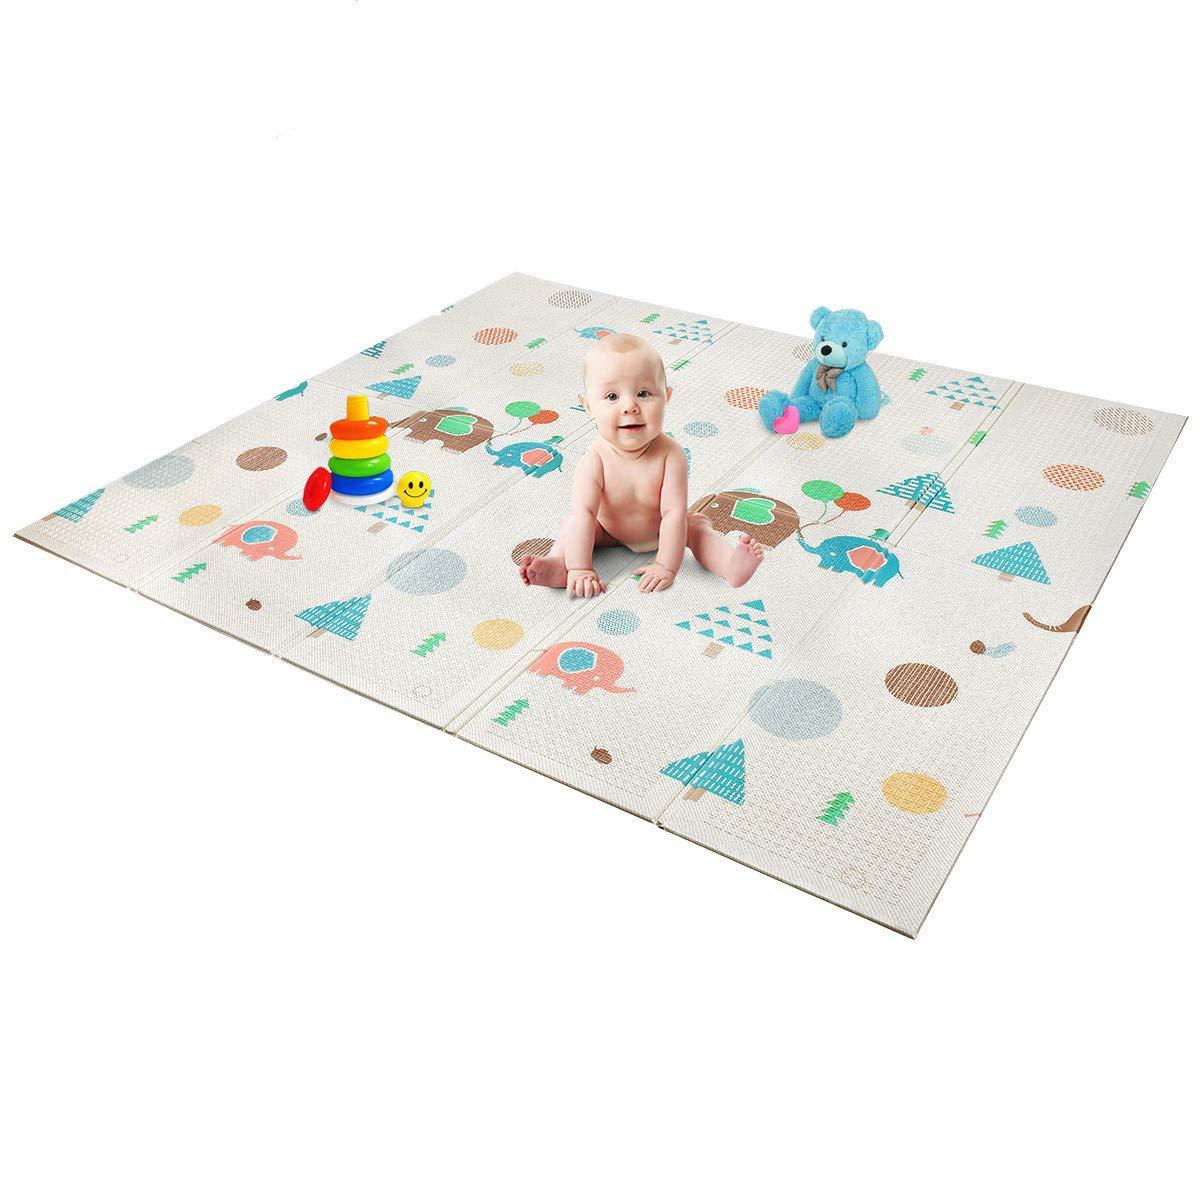 Foldable Play Mat | Non- BPA Non-Toxic Foam Baby Playmat 79